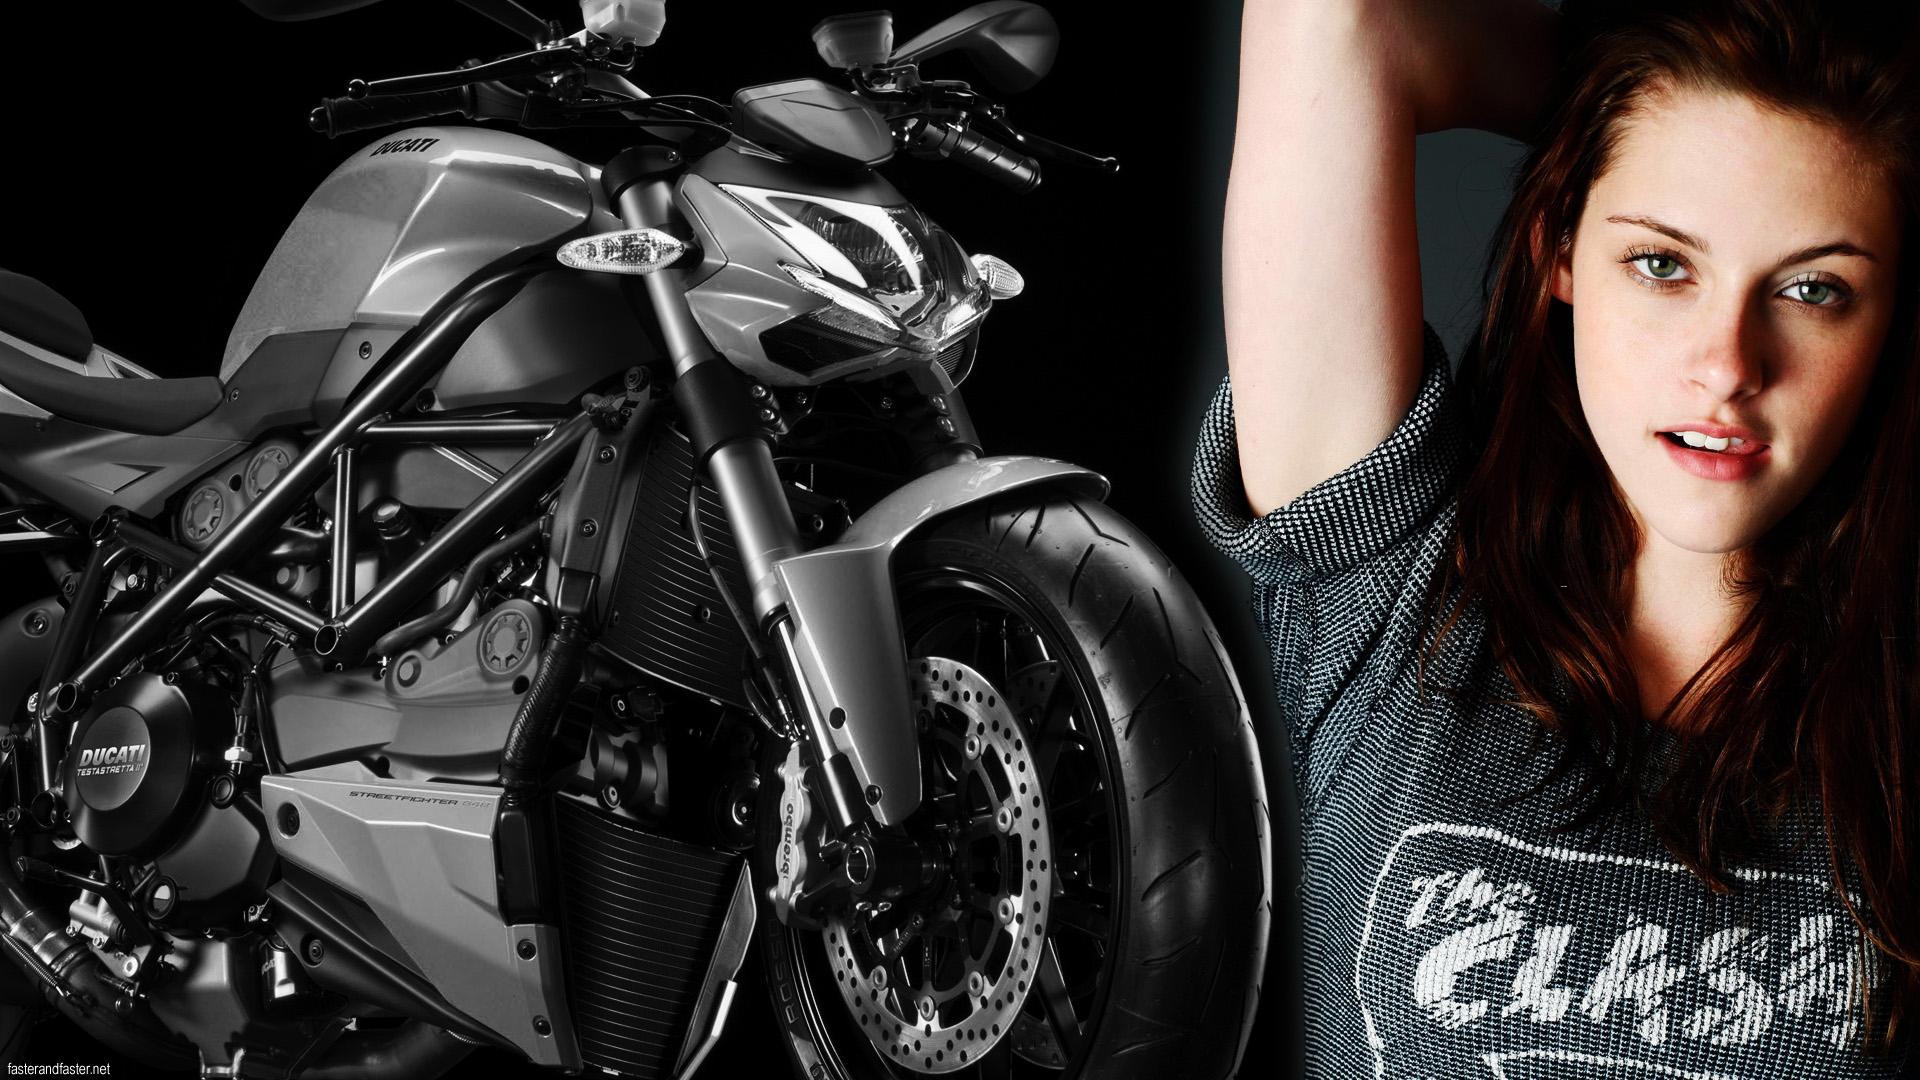 Ducati_Streetfighter_848_1